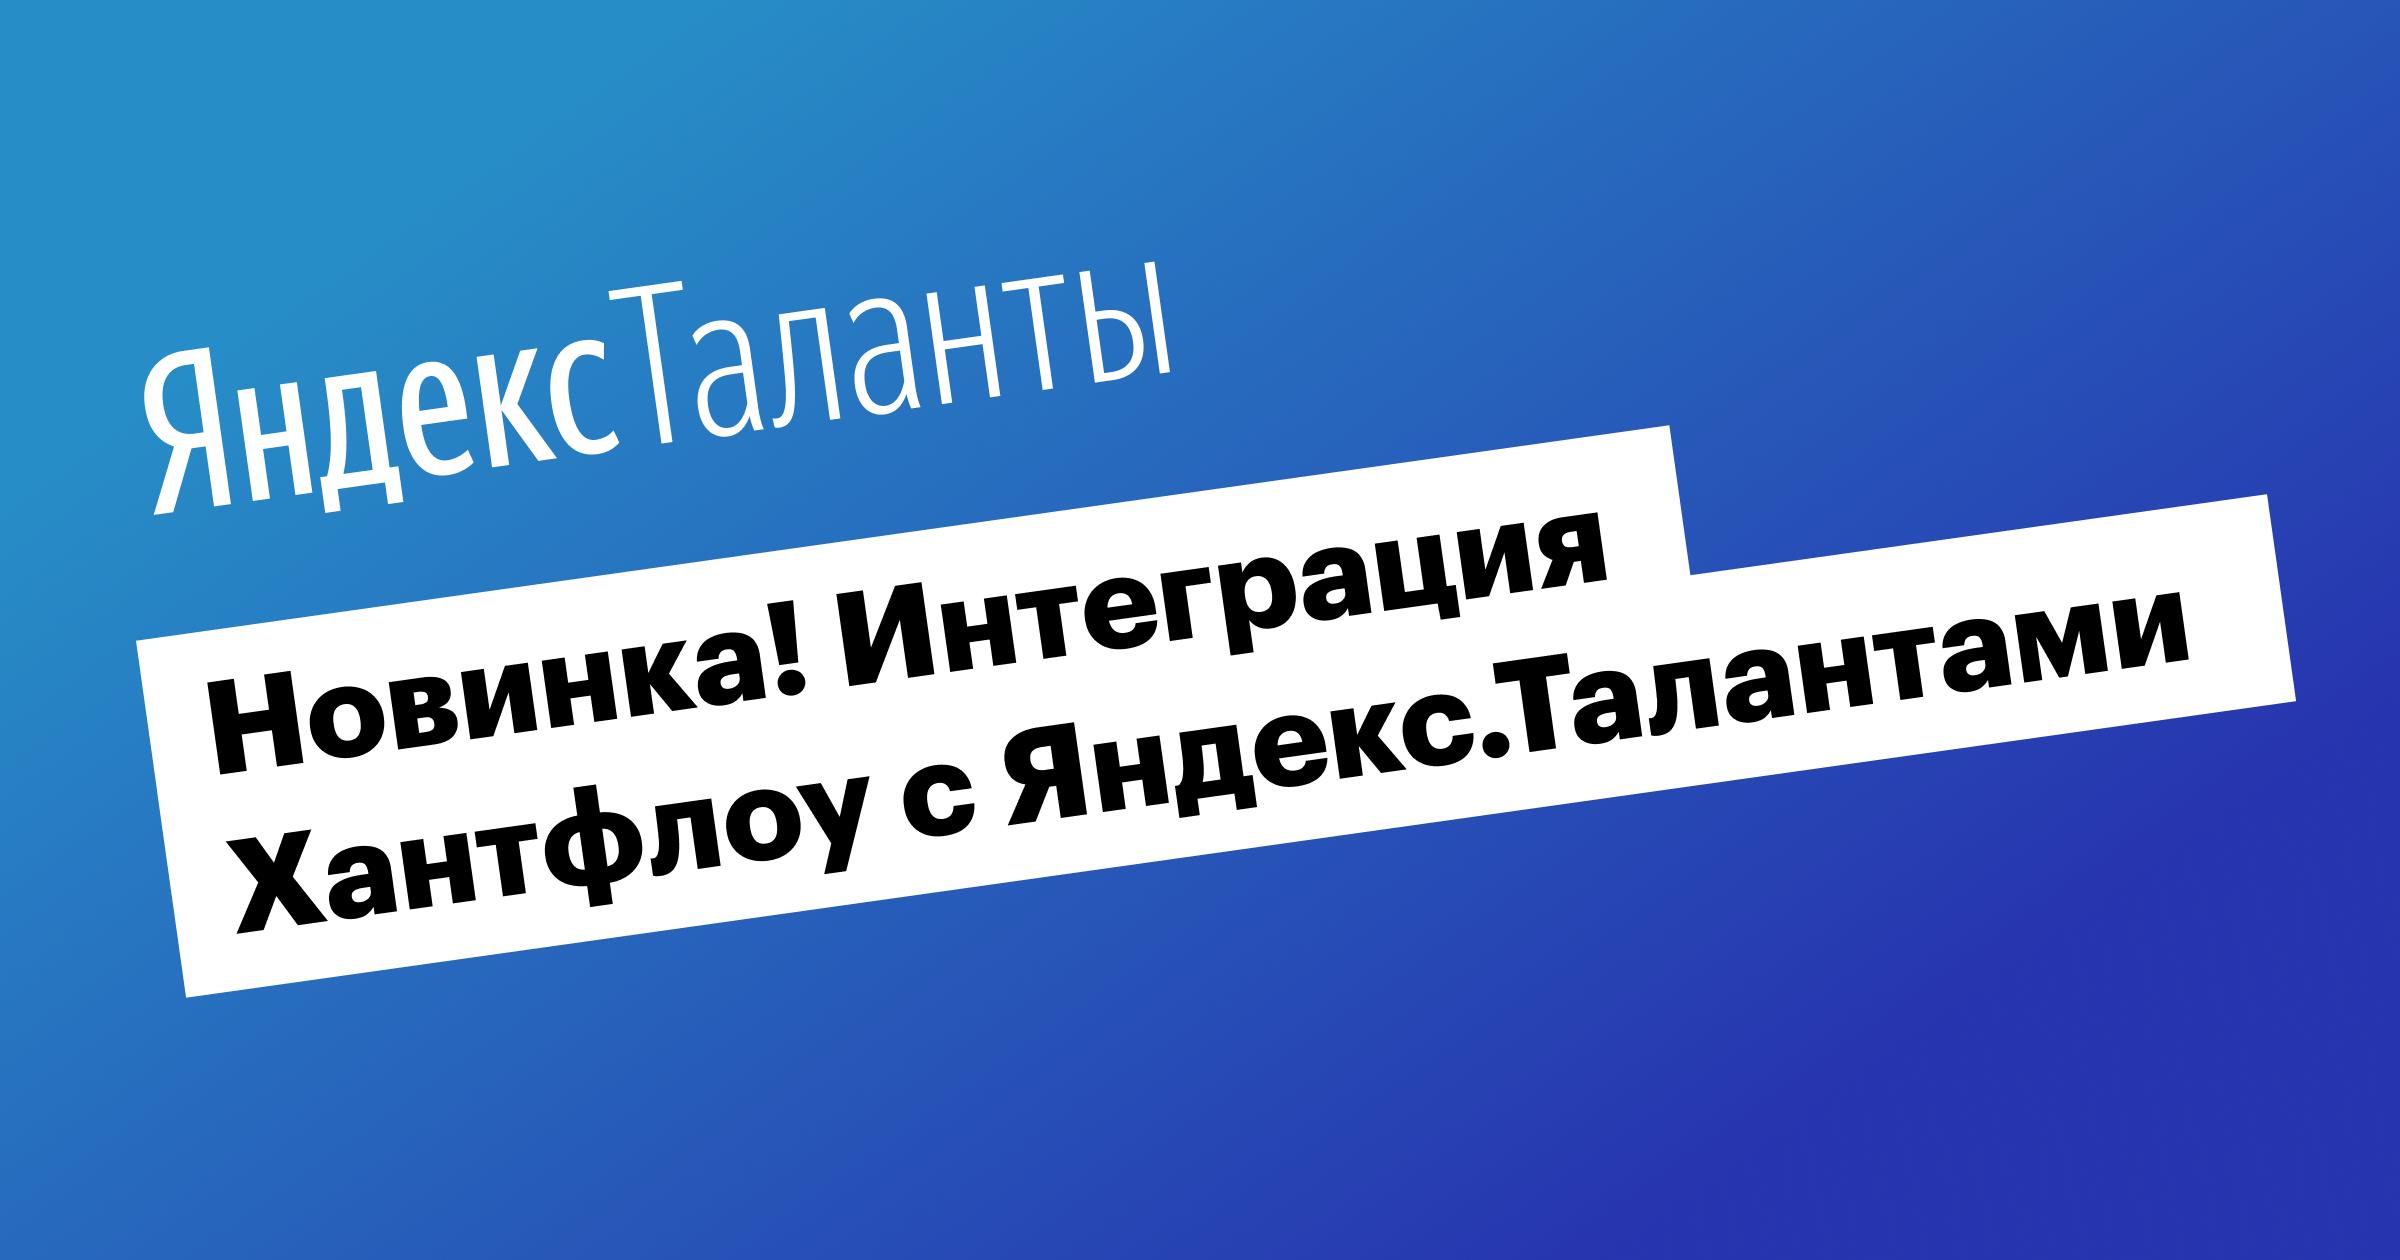 Интеграция Хантфлоу с Яндекс.Талантами